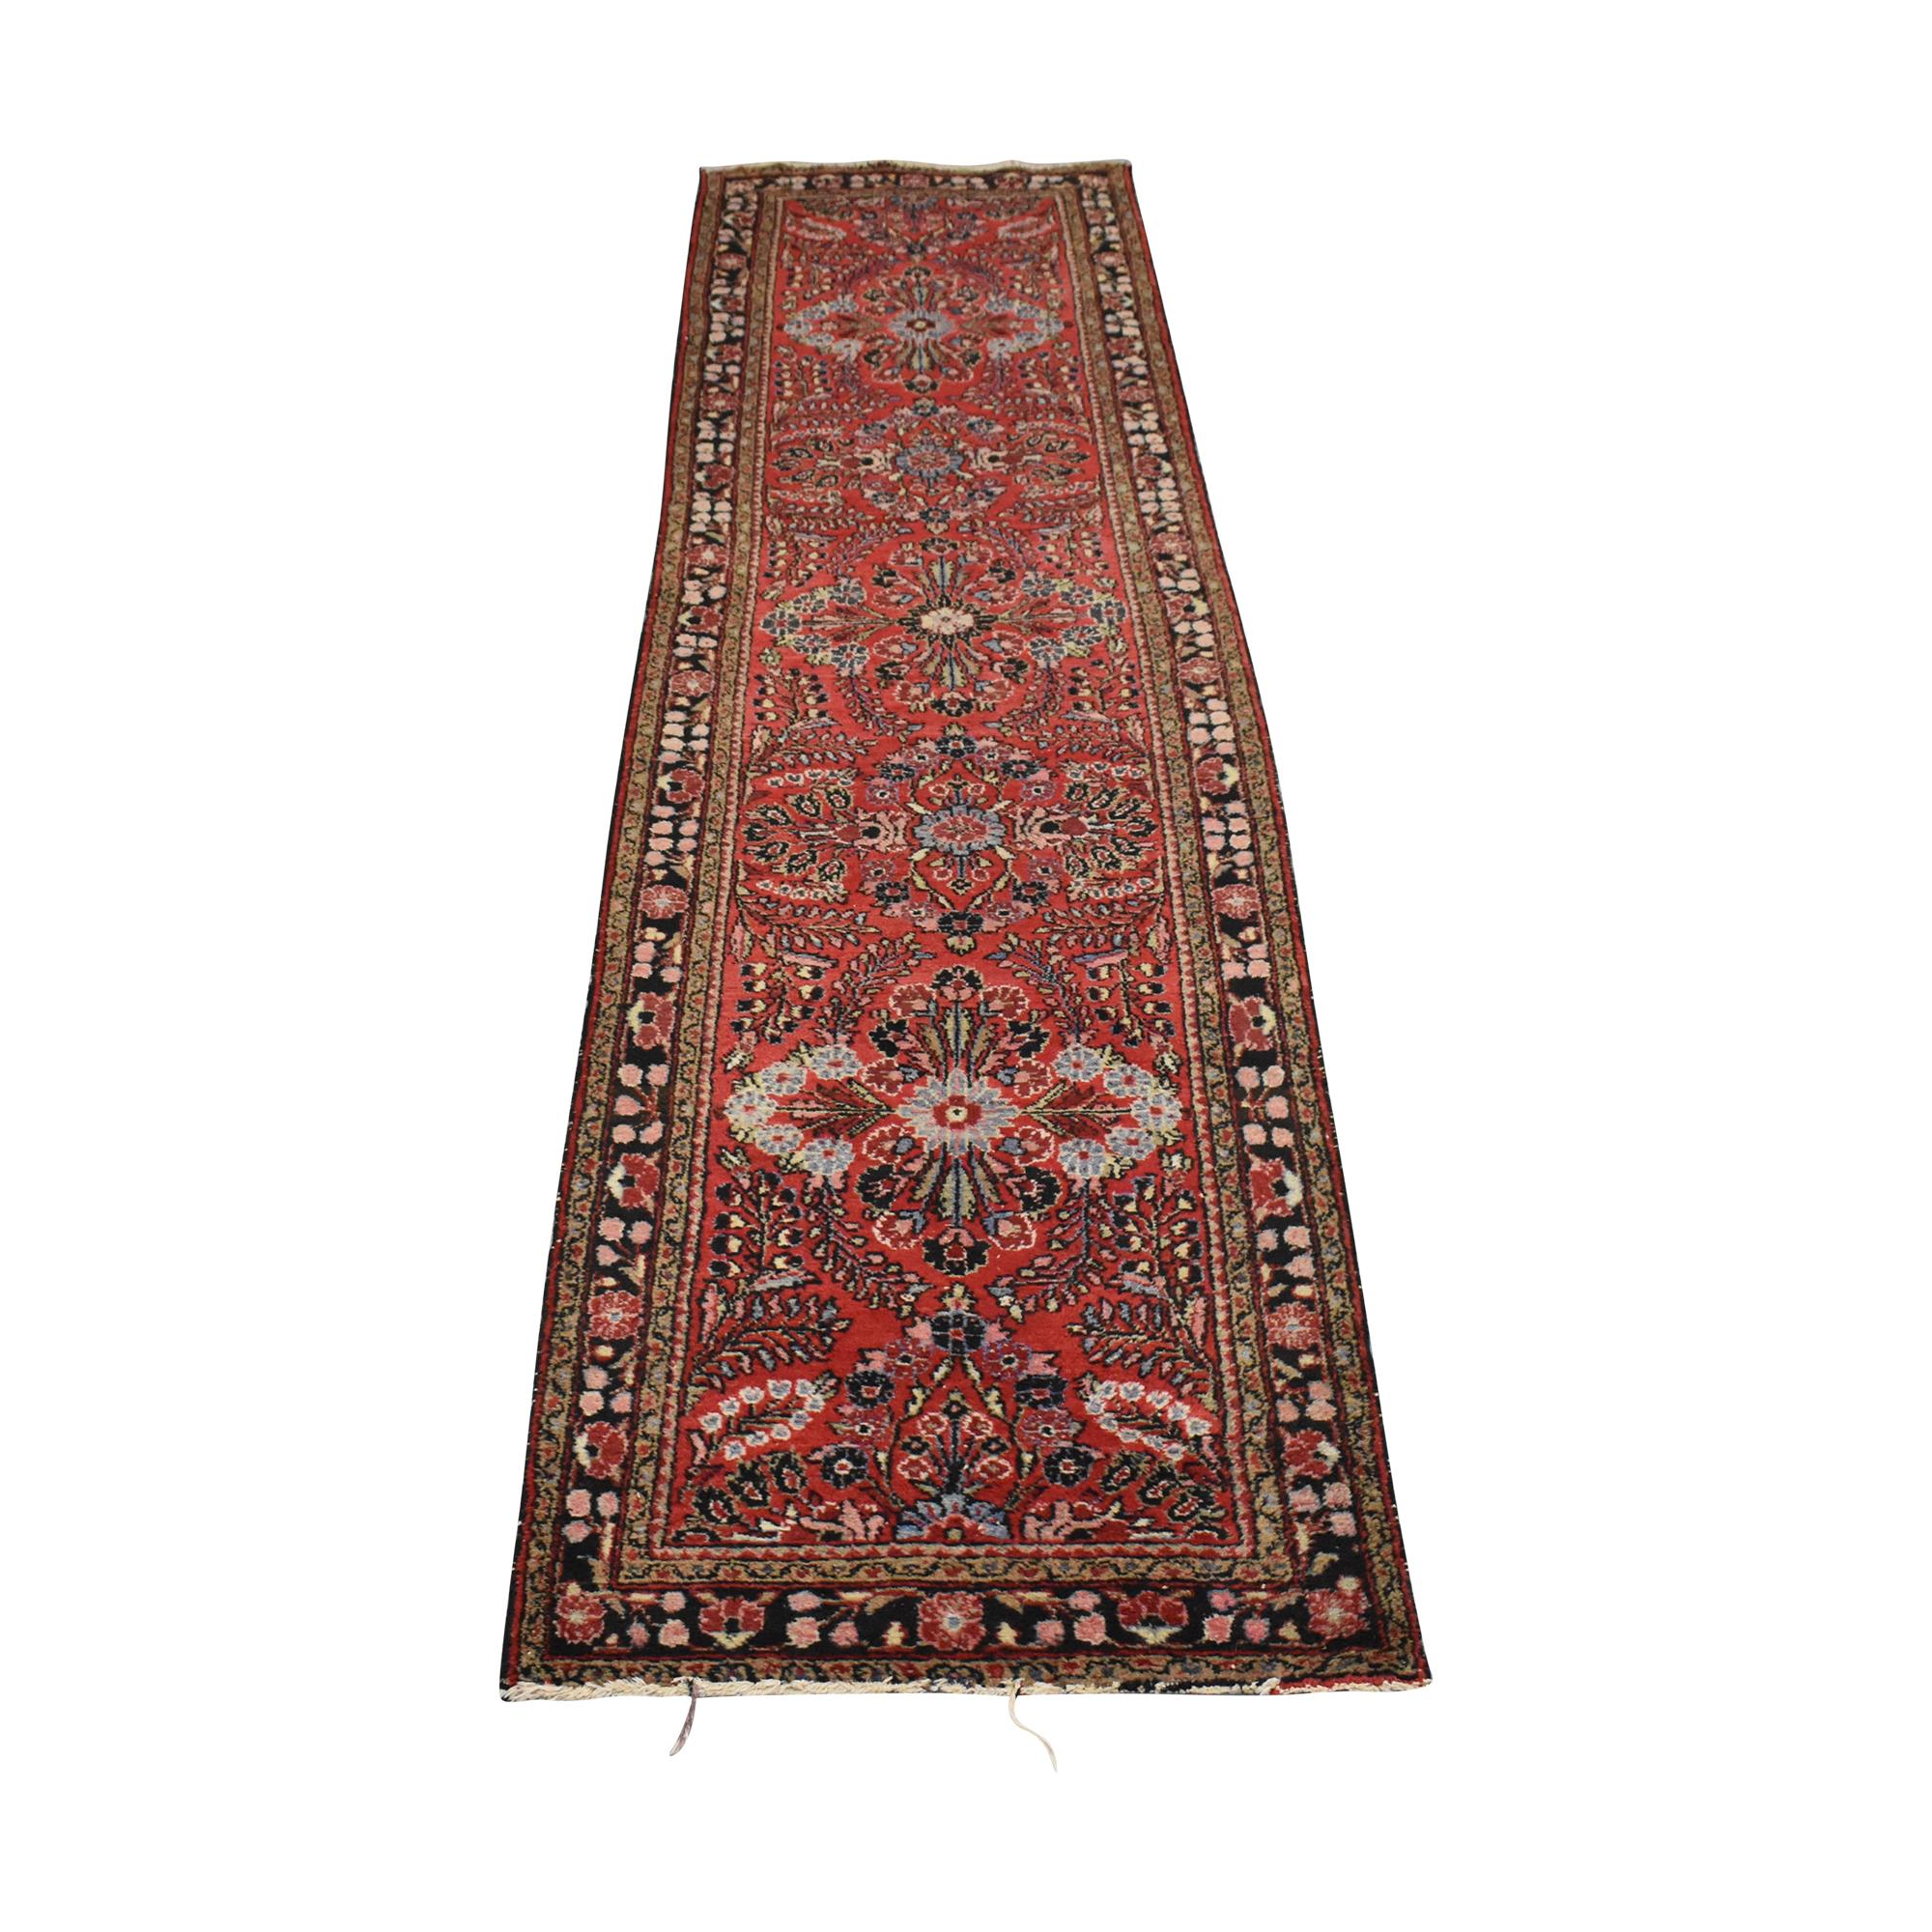 Persian-Style Runner Rug Rugs